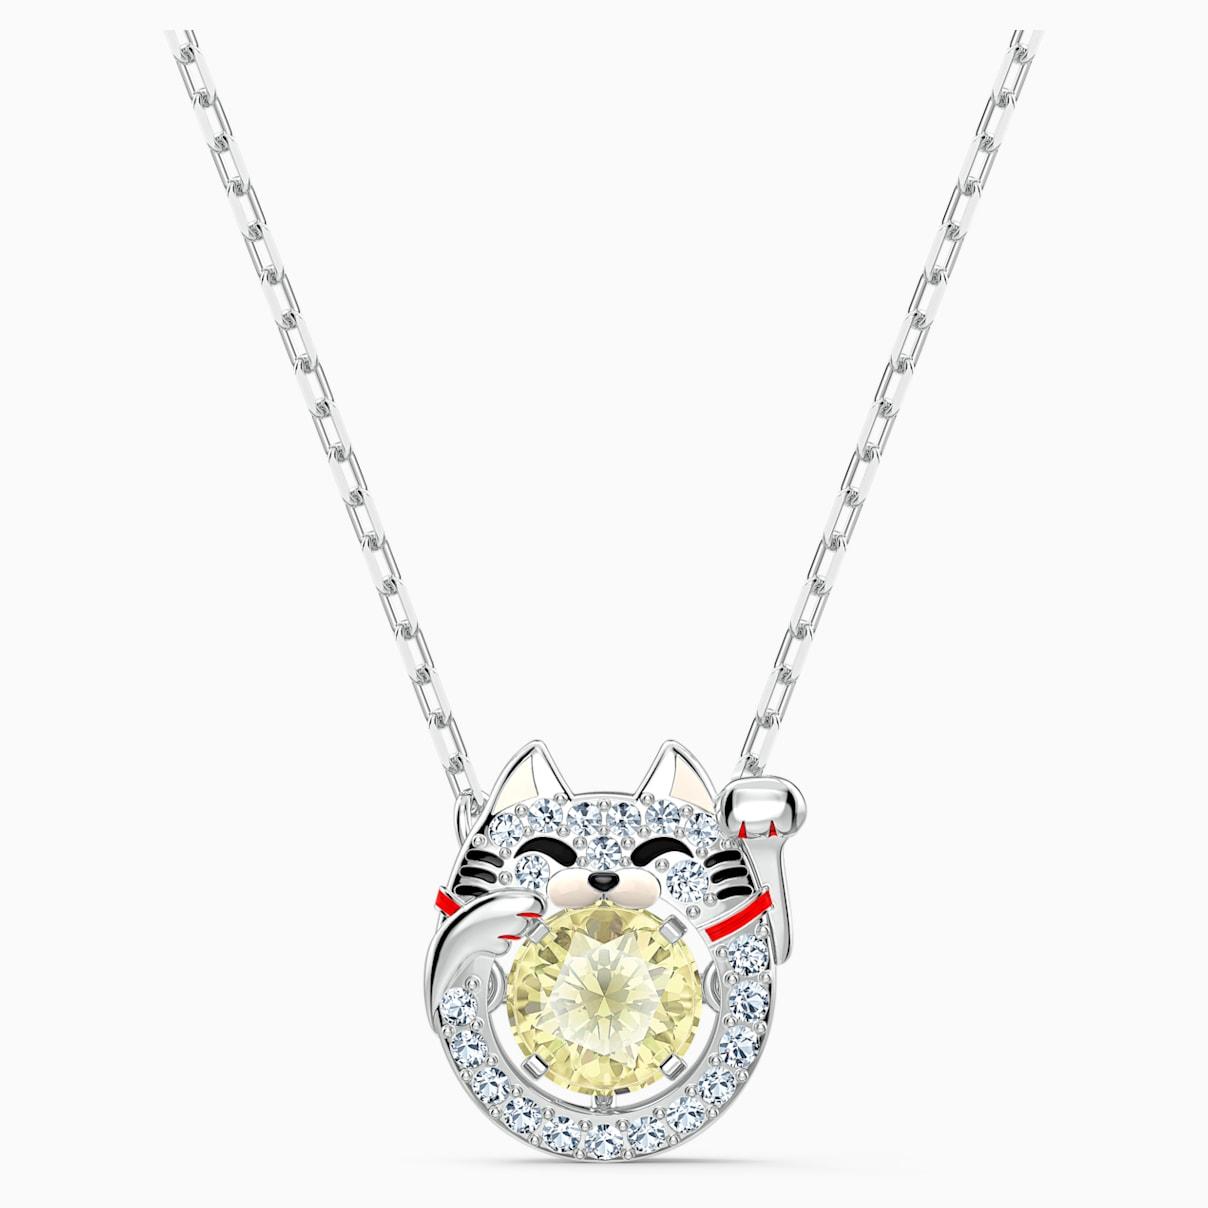 Swarovski Sparkling Dance Cat Necklace, Light multi-colored, Rhodium plated